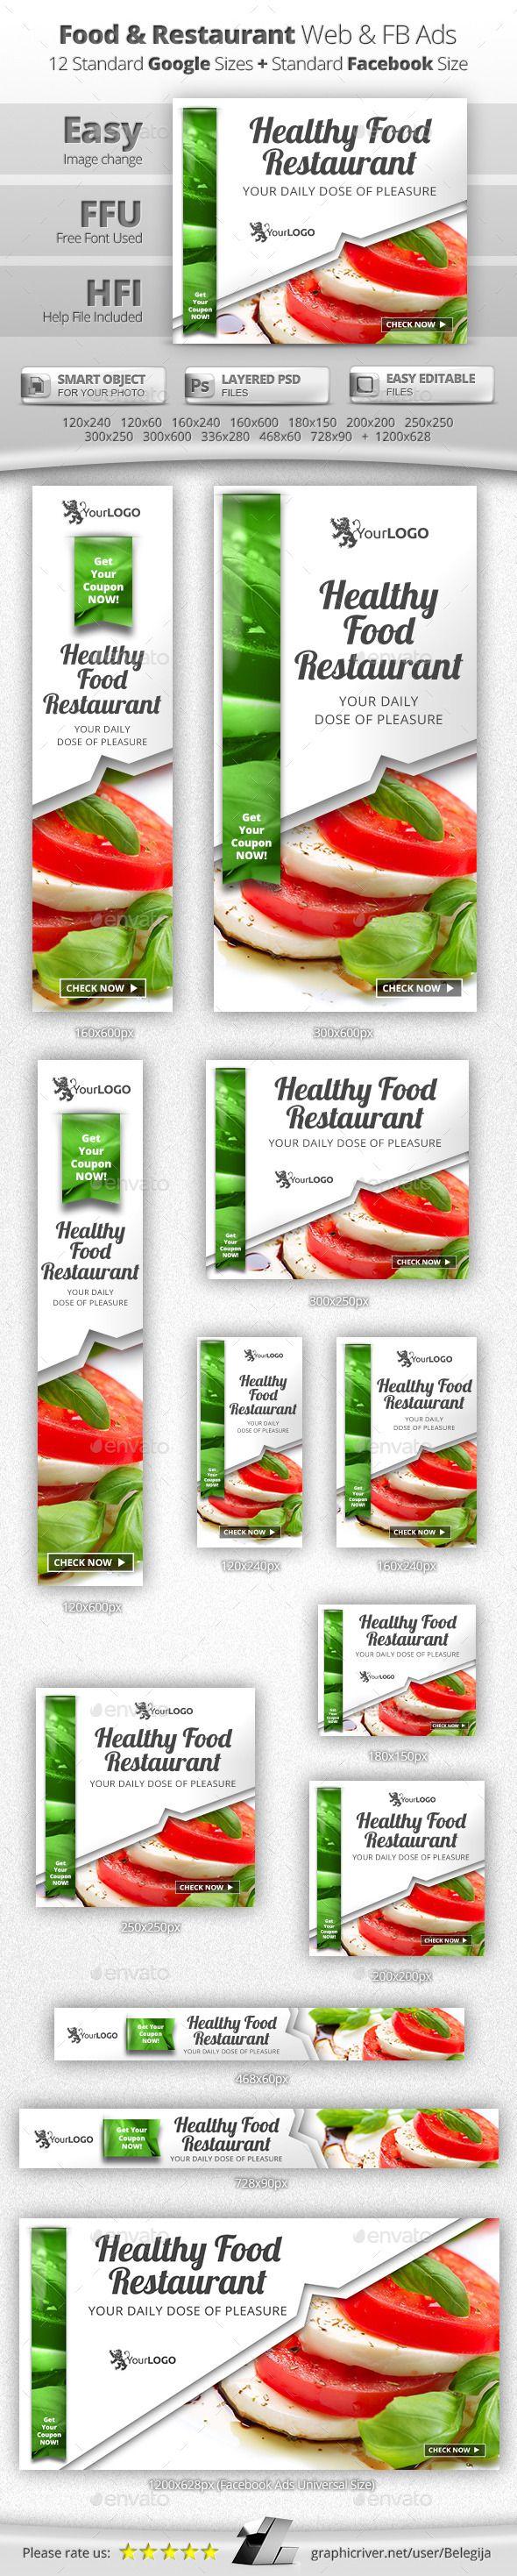 Food & Restaurant Web & Facebook Banners